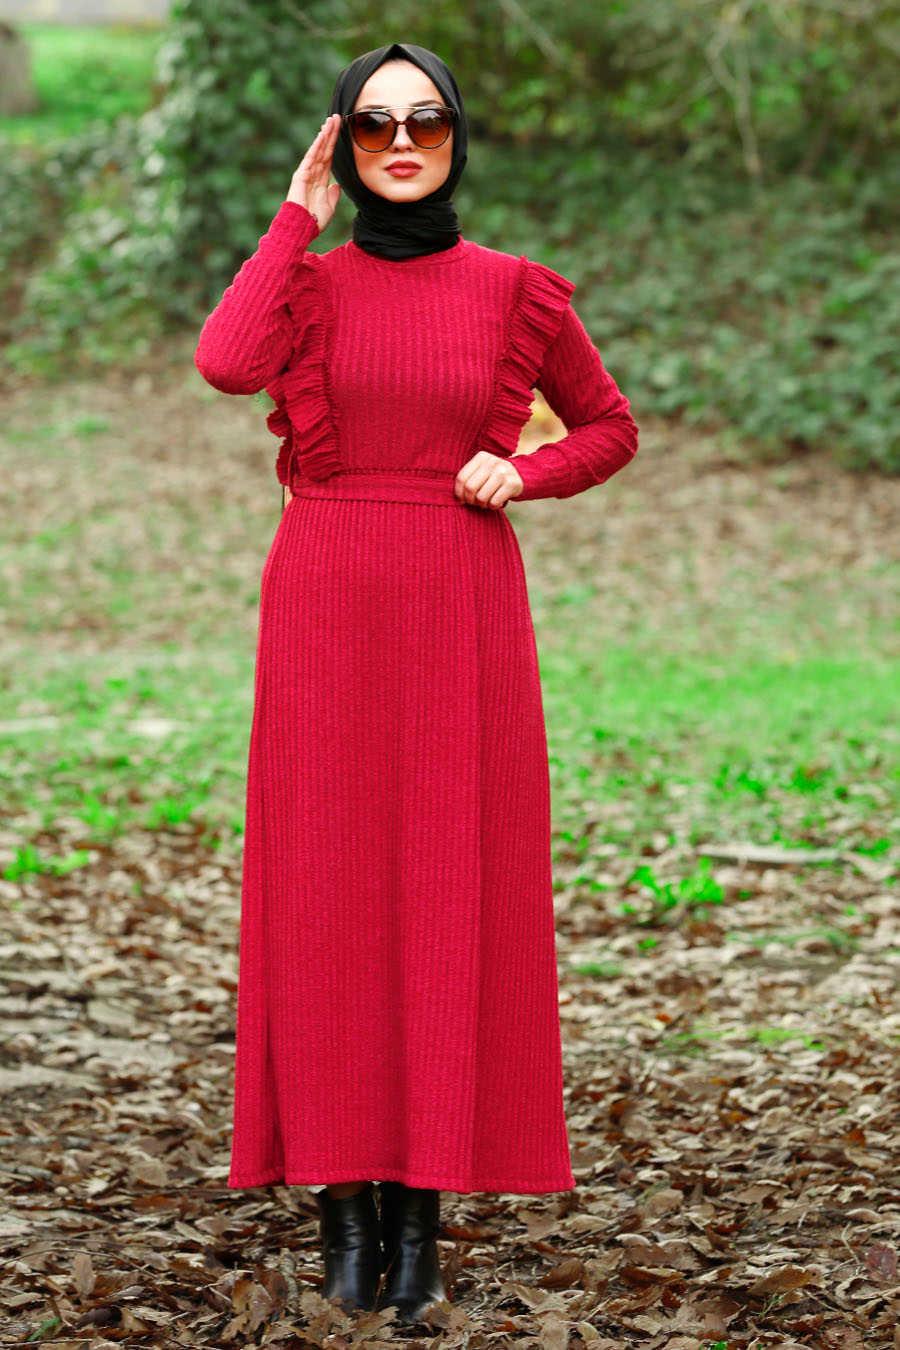 Neva Style - Claret Red Hijab Dress 4032BR